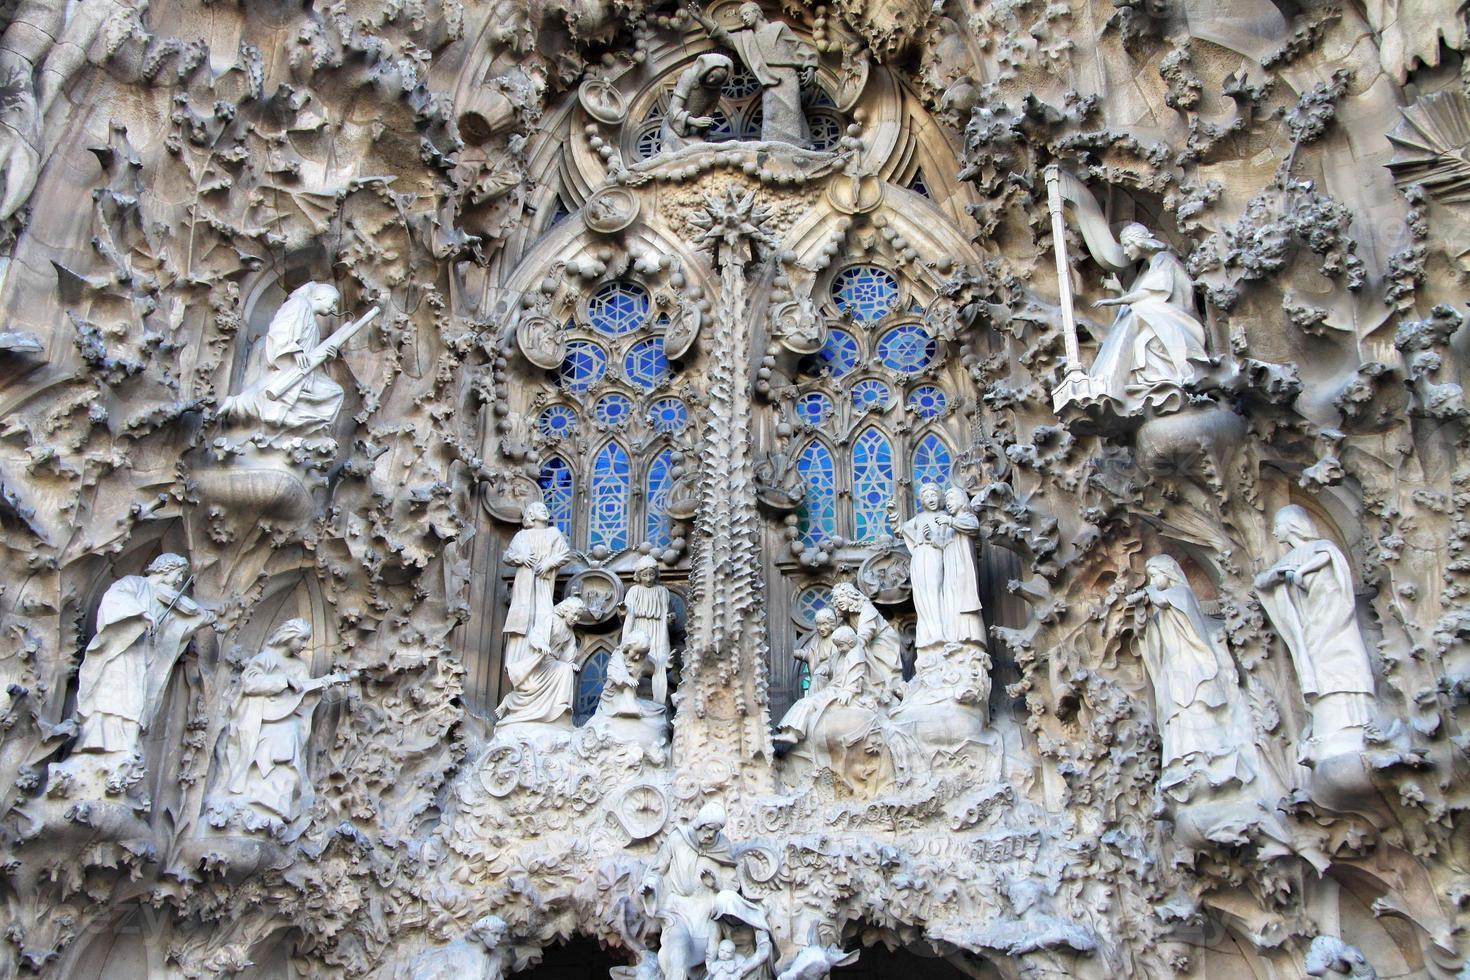 Façade de la Nativité du temple de la Sagrada Familia, Barcelone, Catalogne, Espagne photo